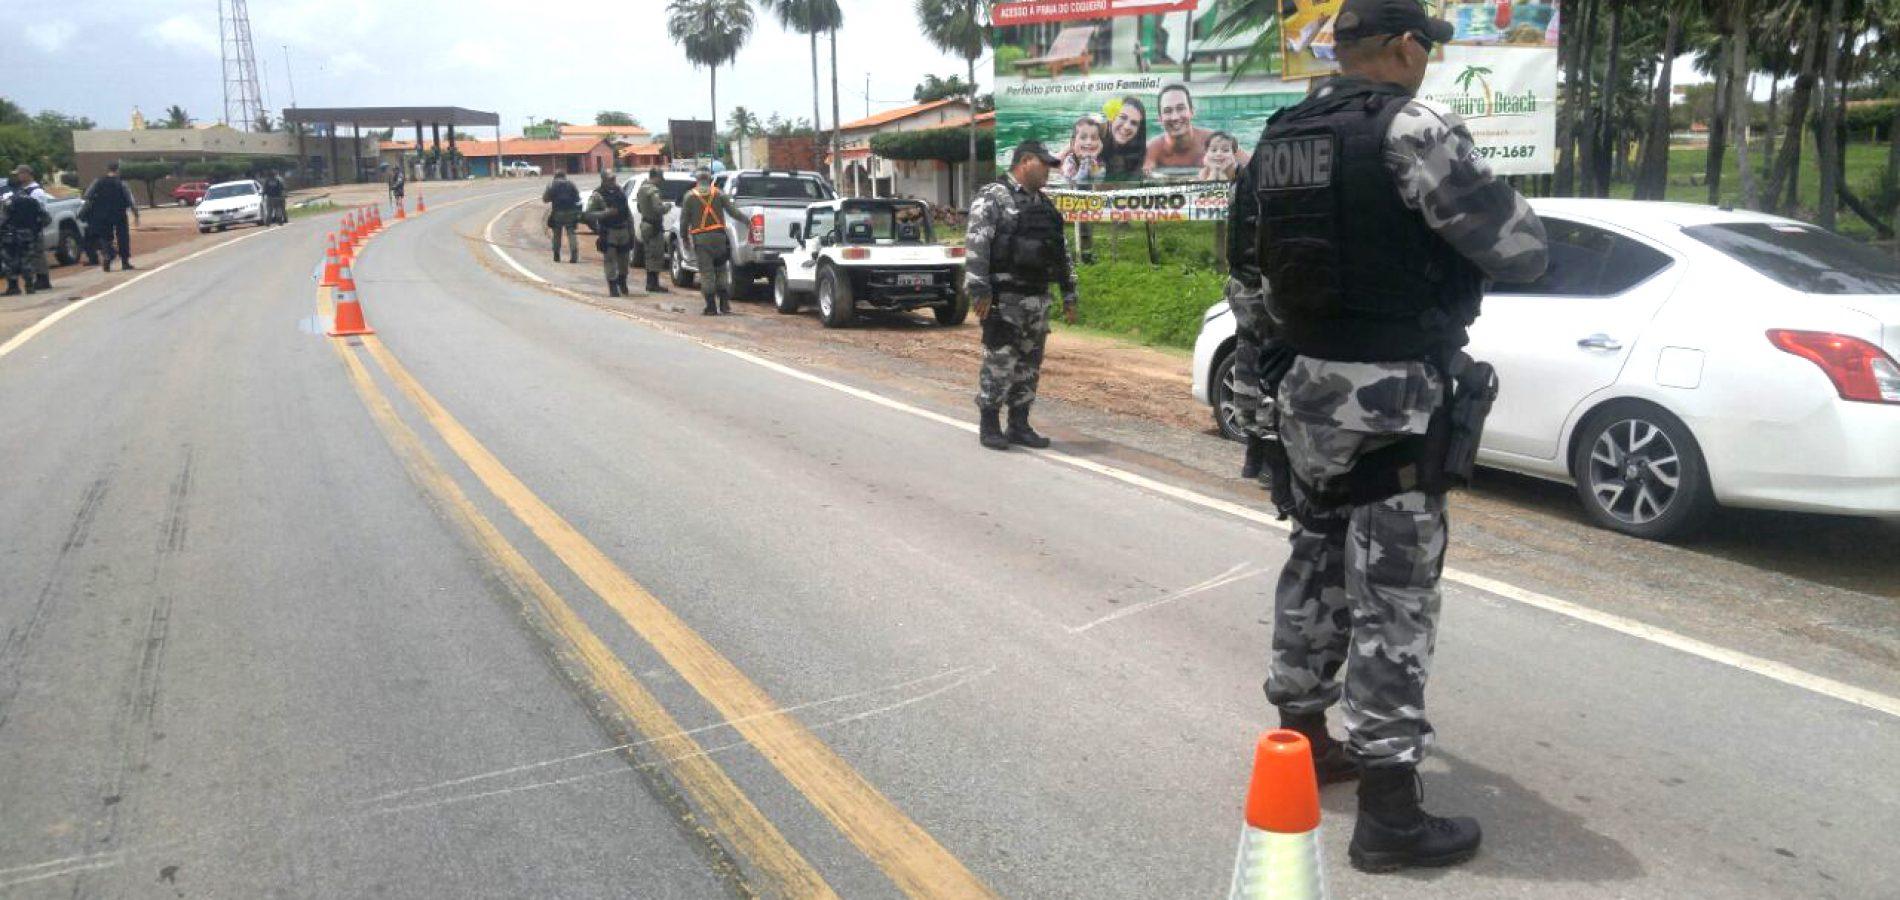 Polícia realiza barreiras para evitar entrada de armas no Piauí